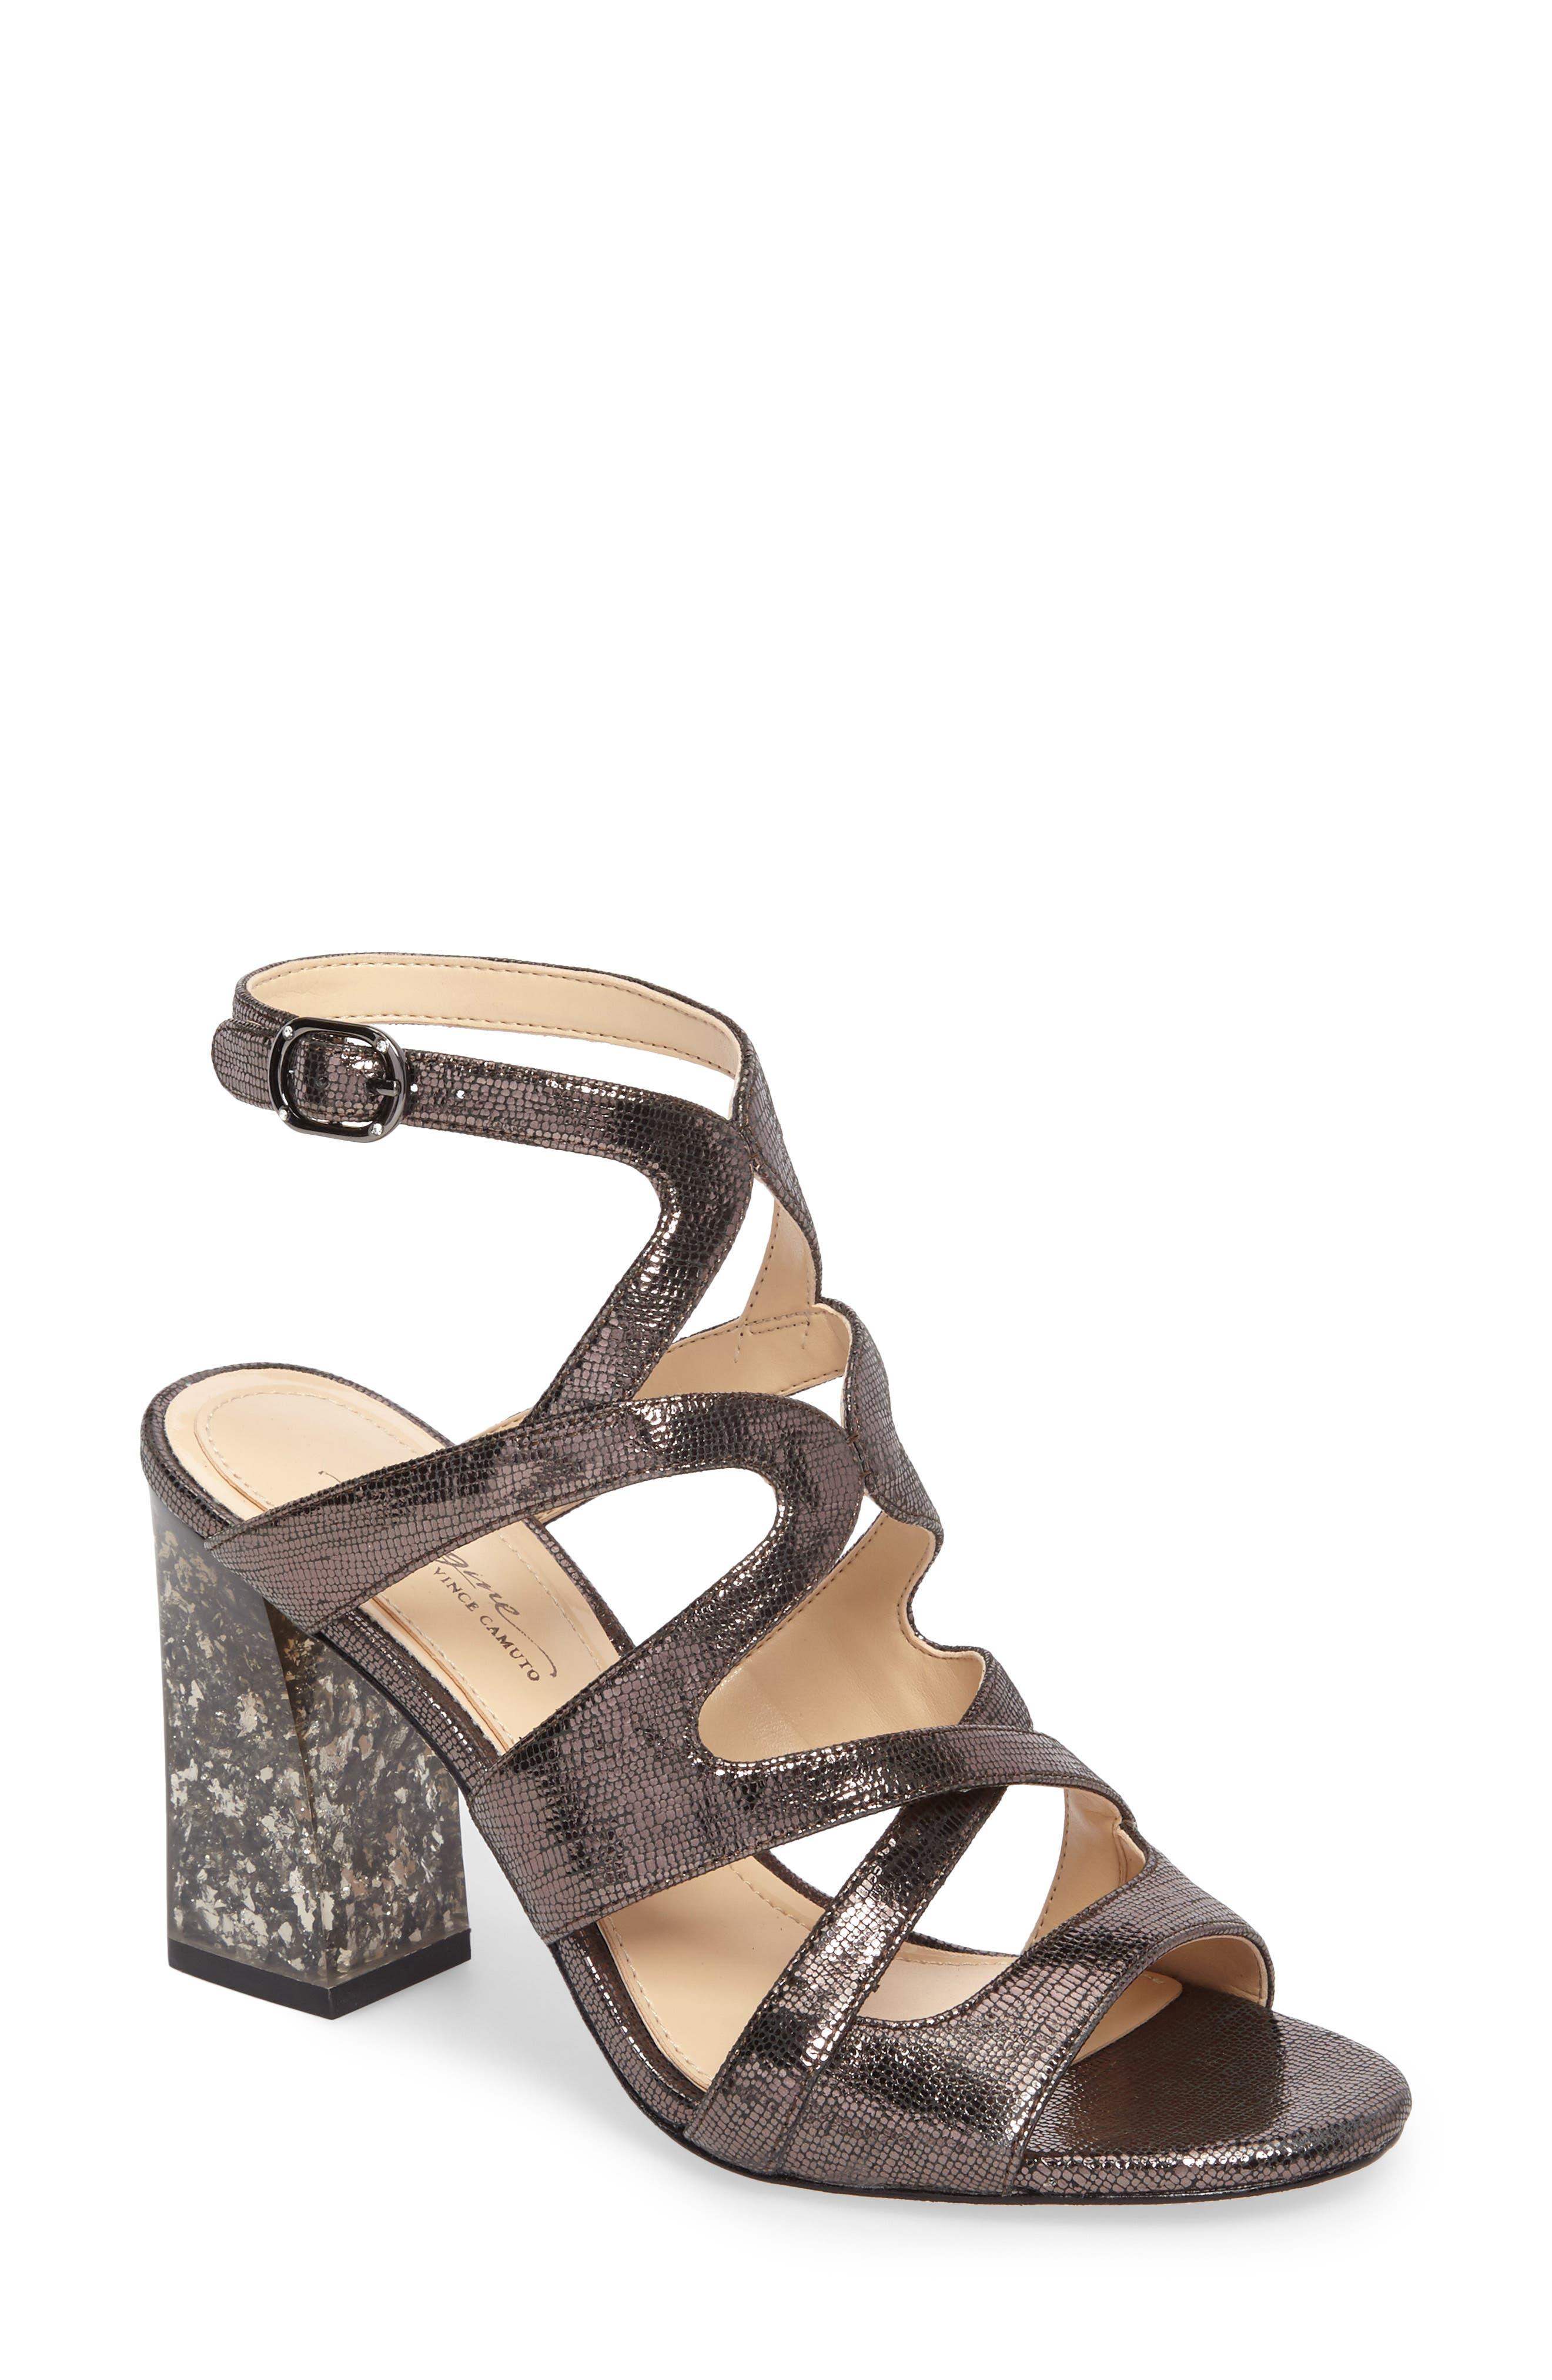 Imagine Vince Camuto Zahira Statement Heel Sandal,                         Main,                         color,